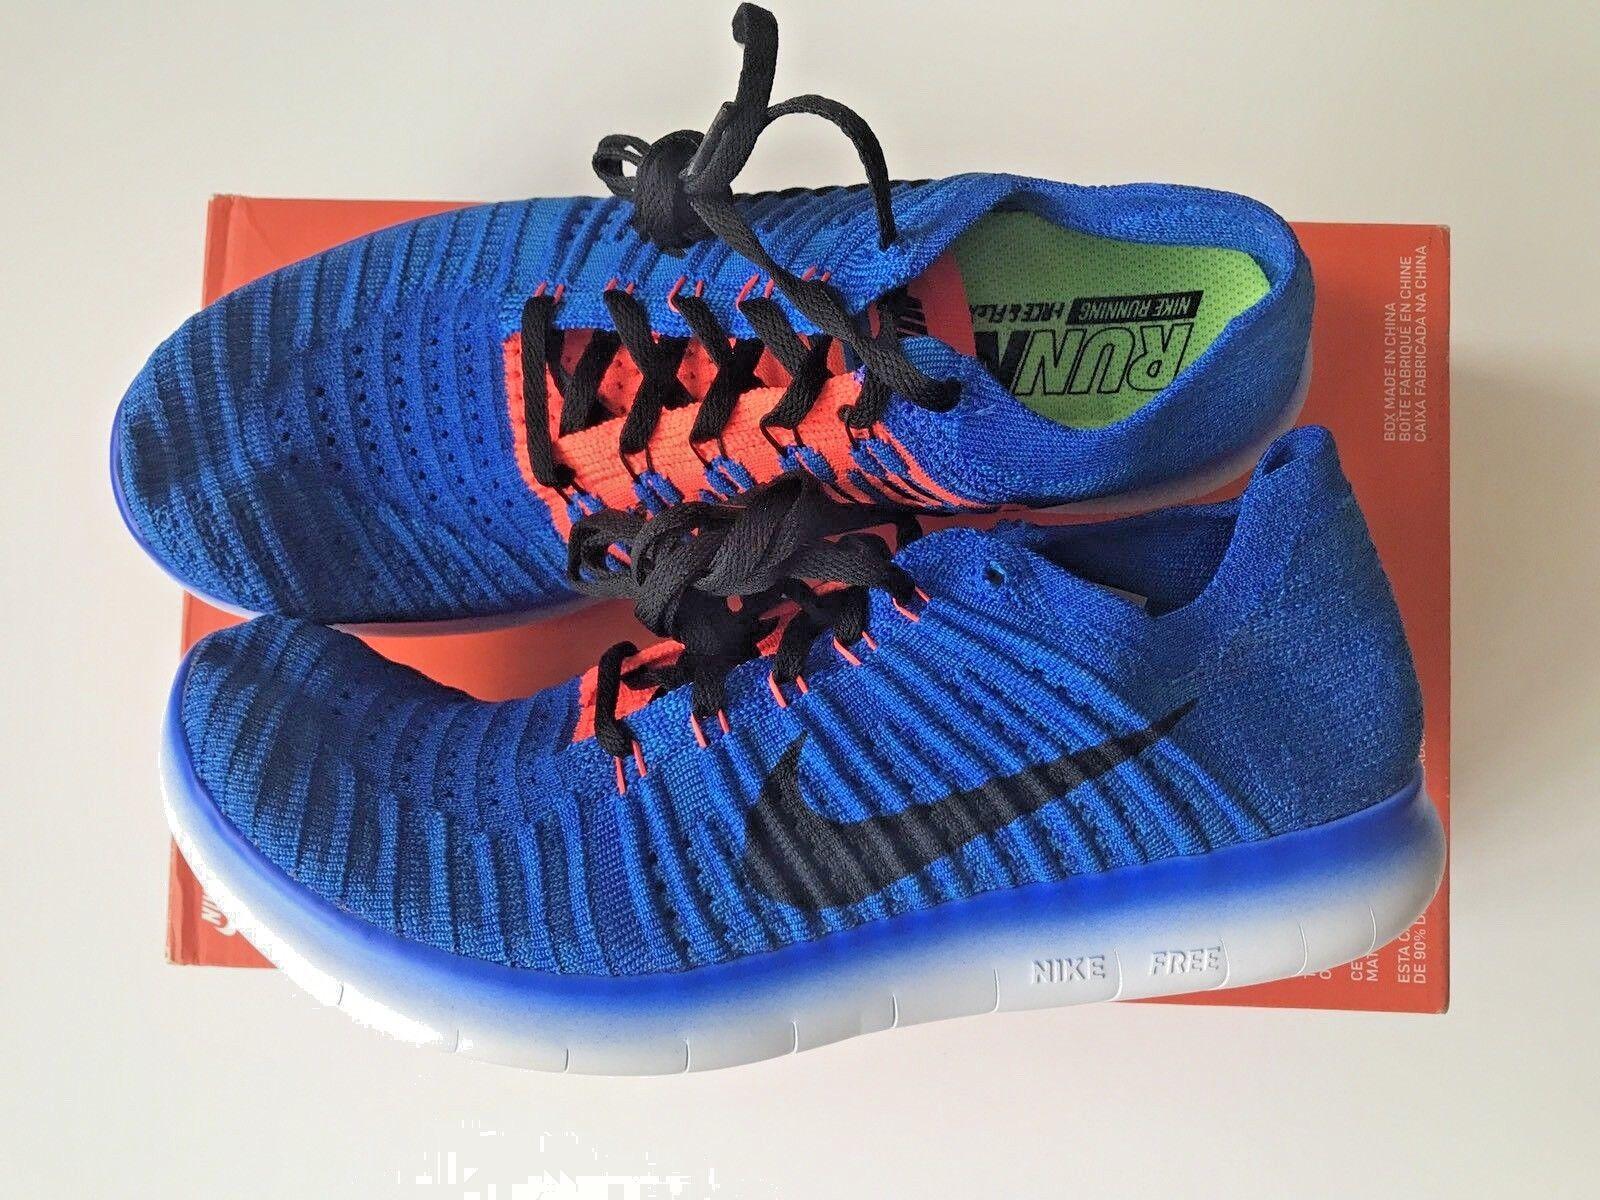 Nike libera rn flyknit scarpe da corsa formatori dimensione blu / squadra arancione